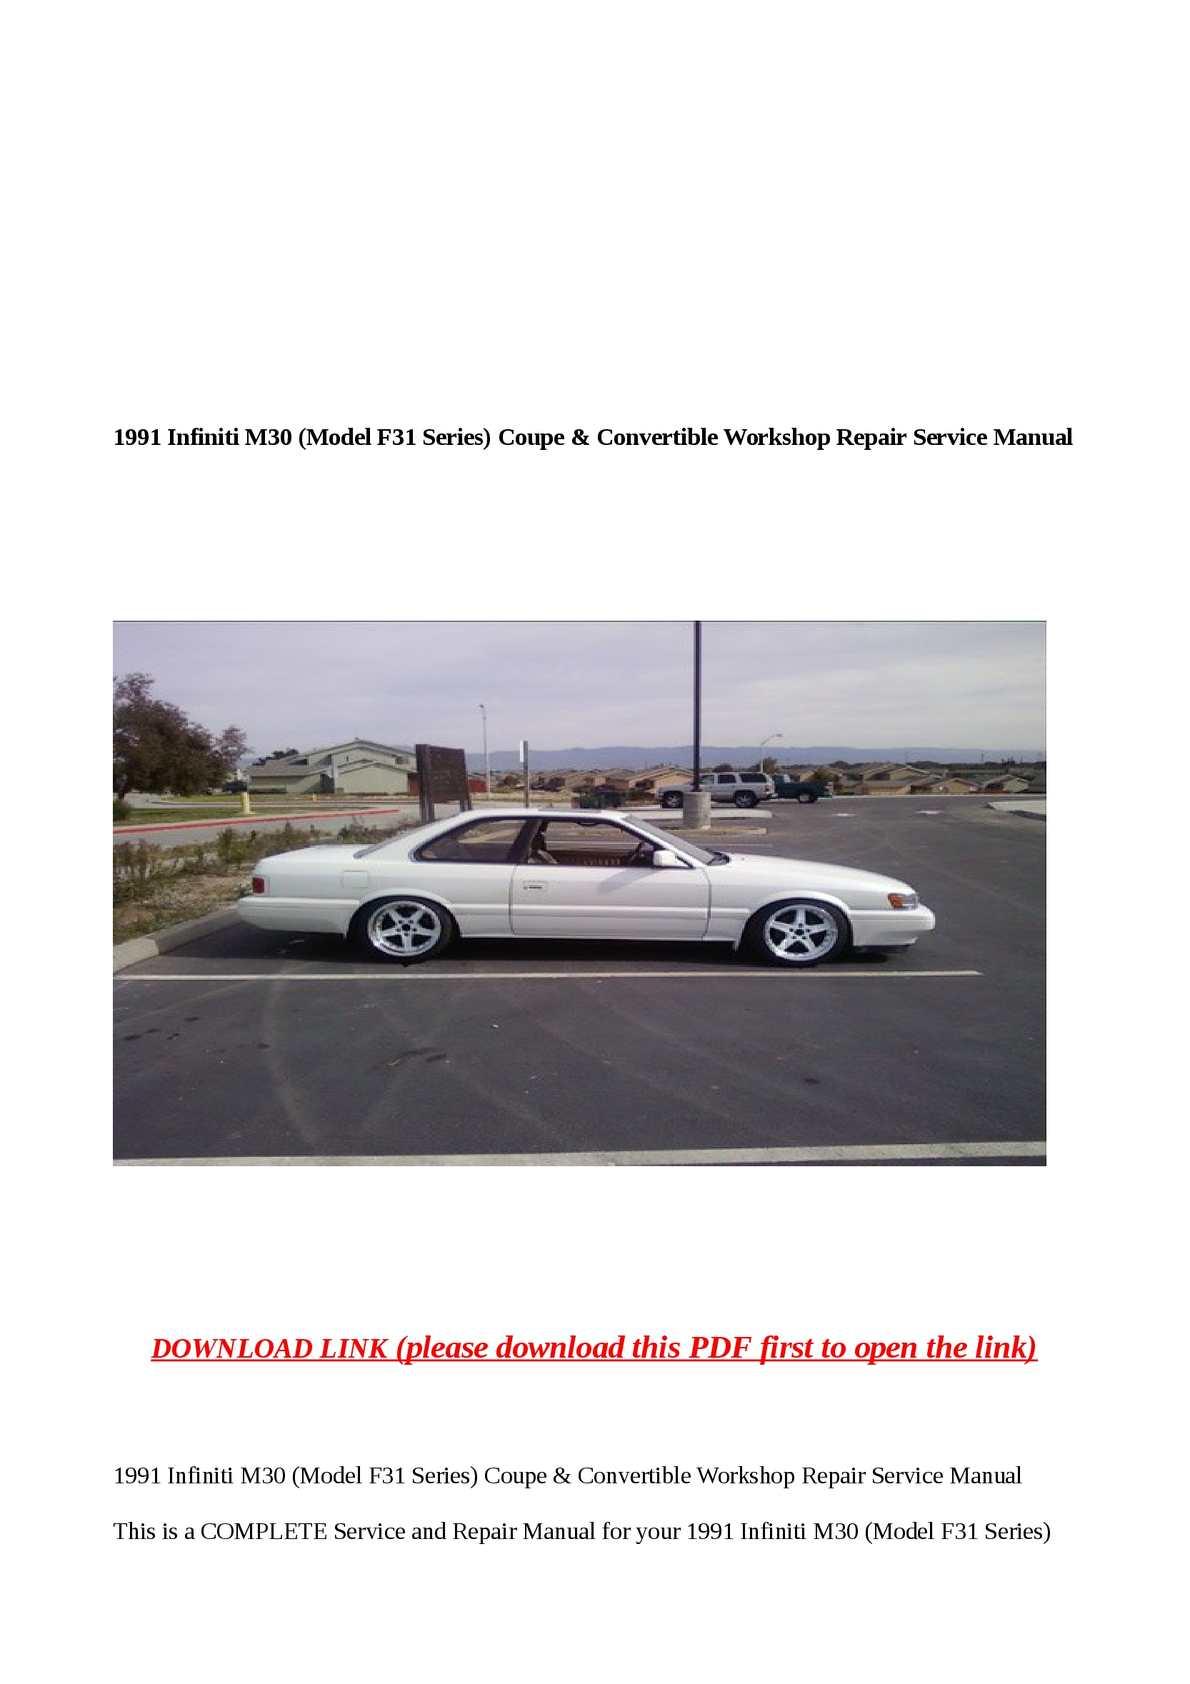 Calaméo - 1991 Infiniti M30 (Model F31 Series) Coupe & Convertible Workshop